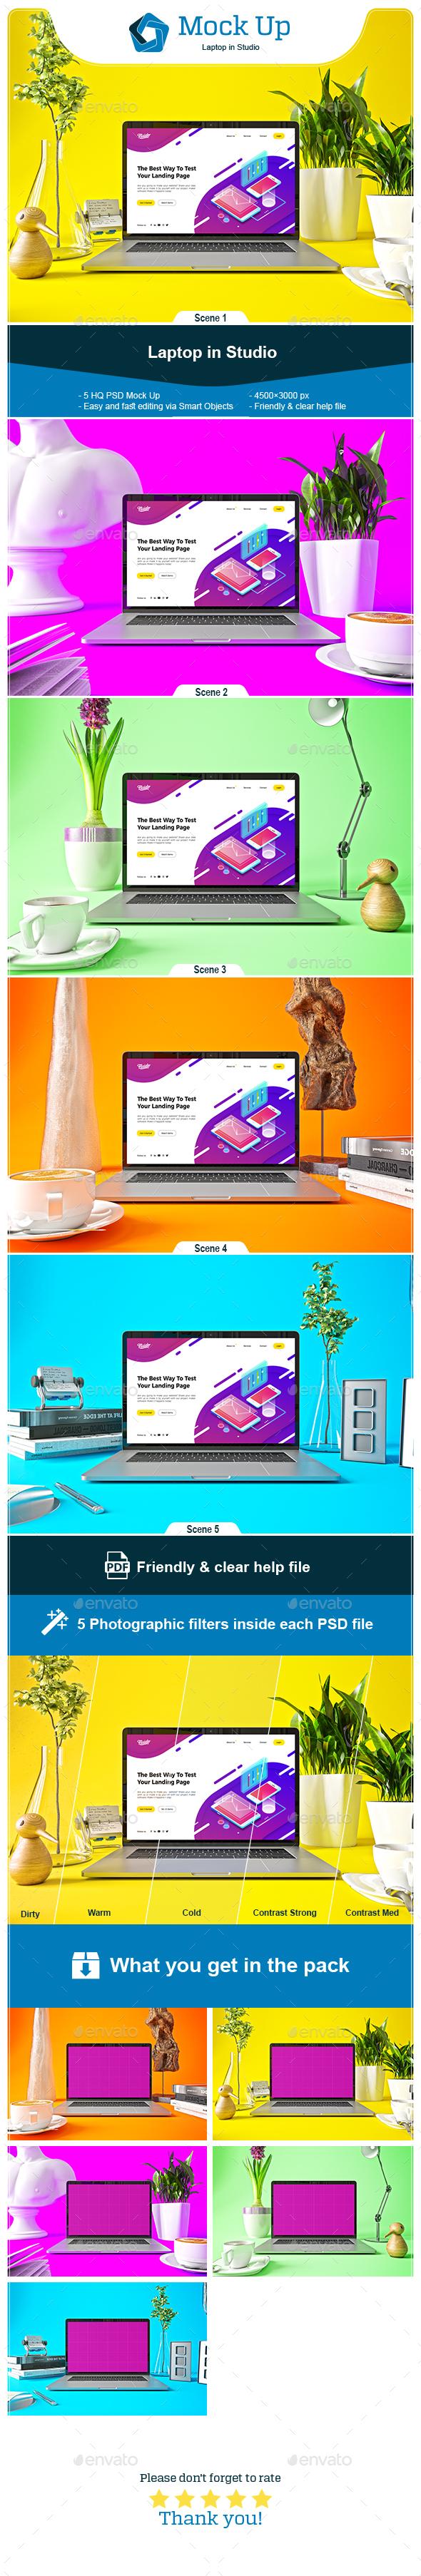 Laptop Pro in Studio - Laptop Displays